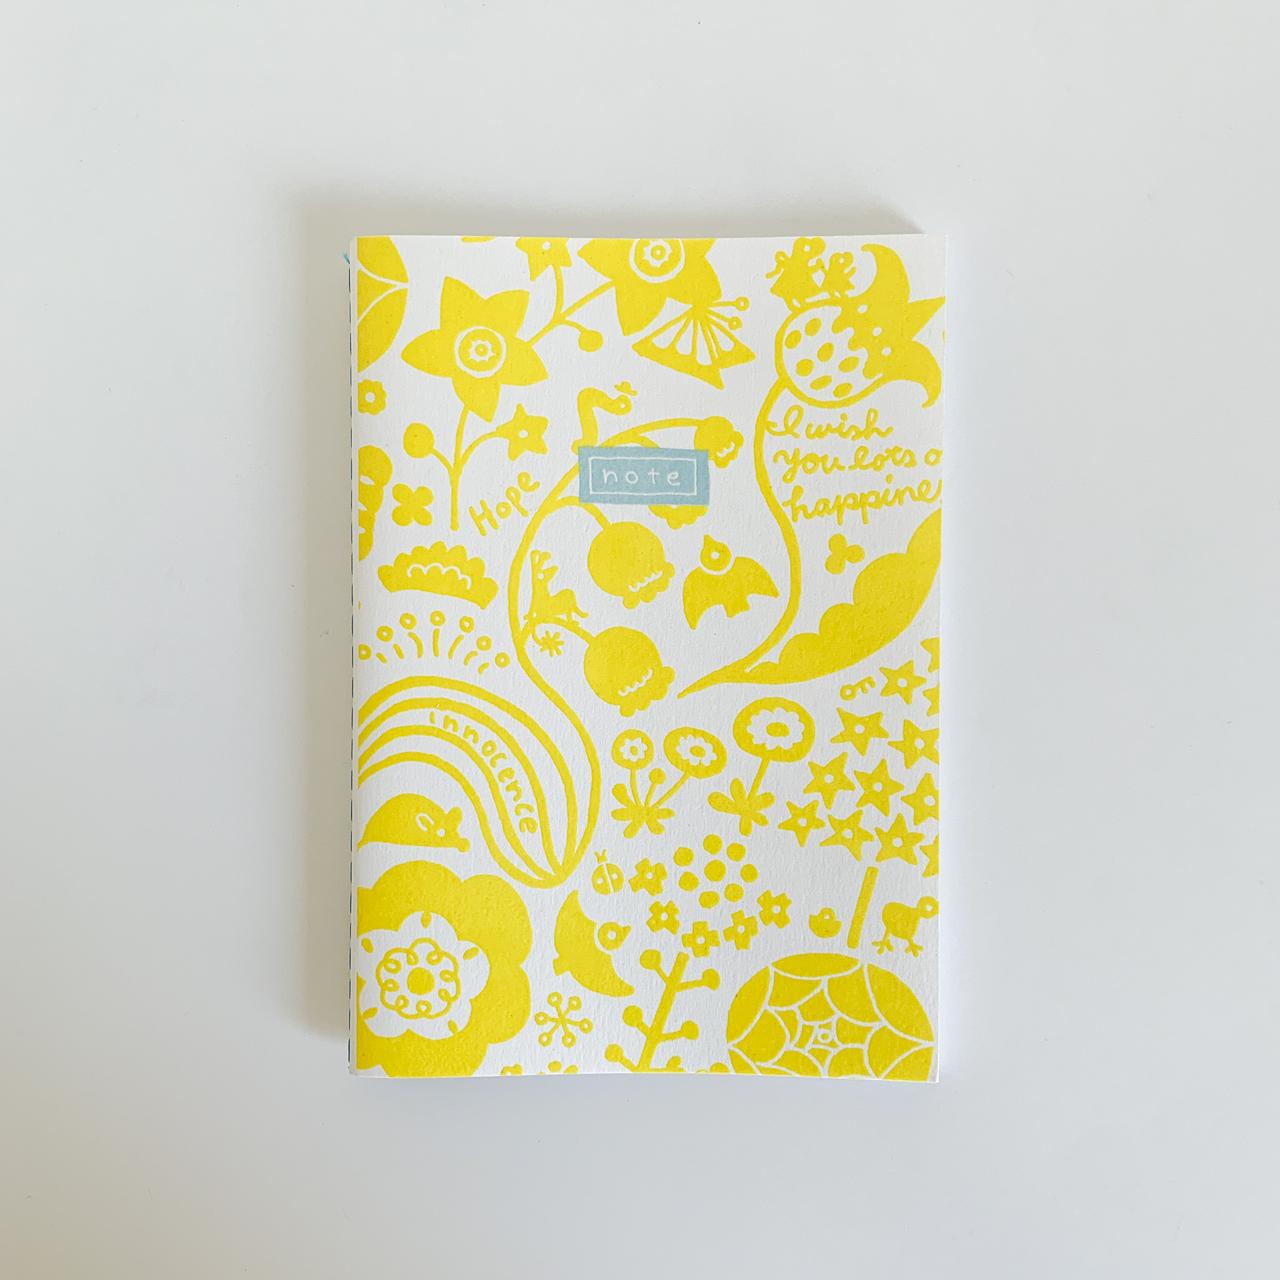 [15th special price ]心が晴れる・mini ノート ミモザイエロー